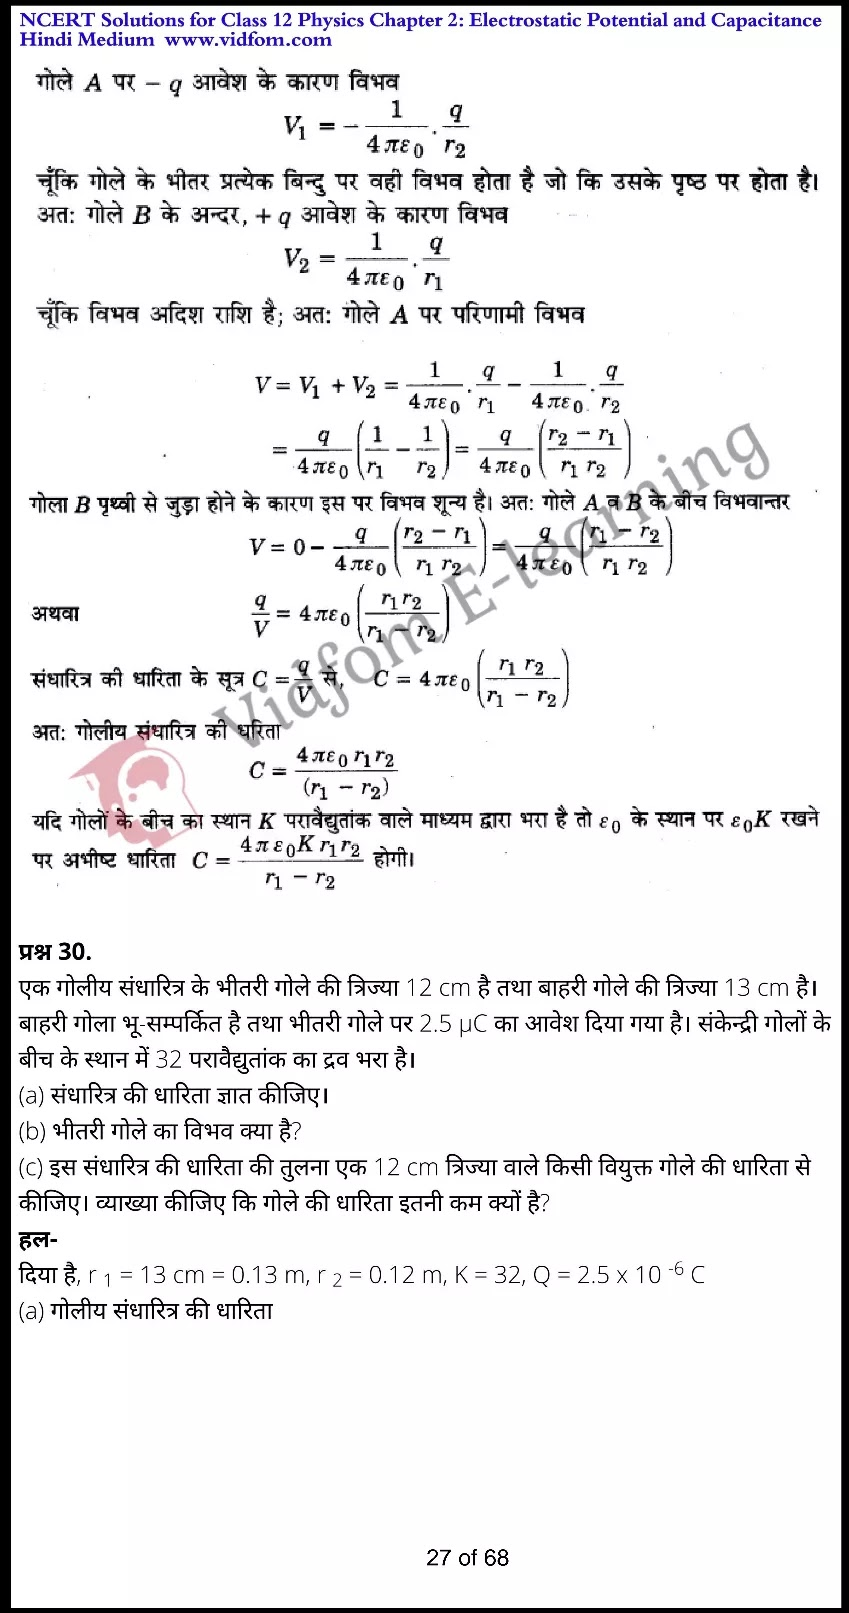 class 12 physics chapter 2 light hindi medium 27